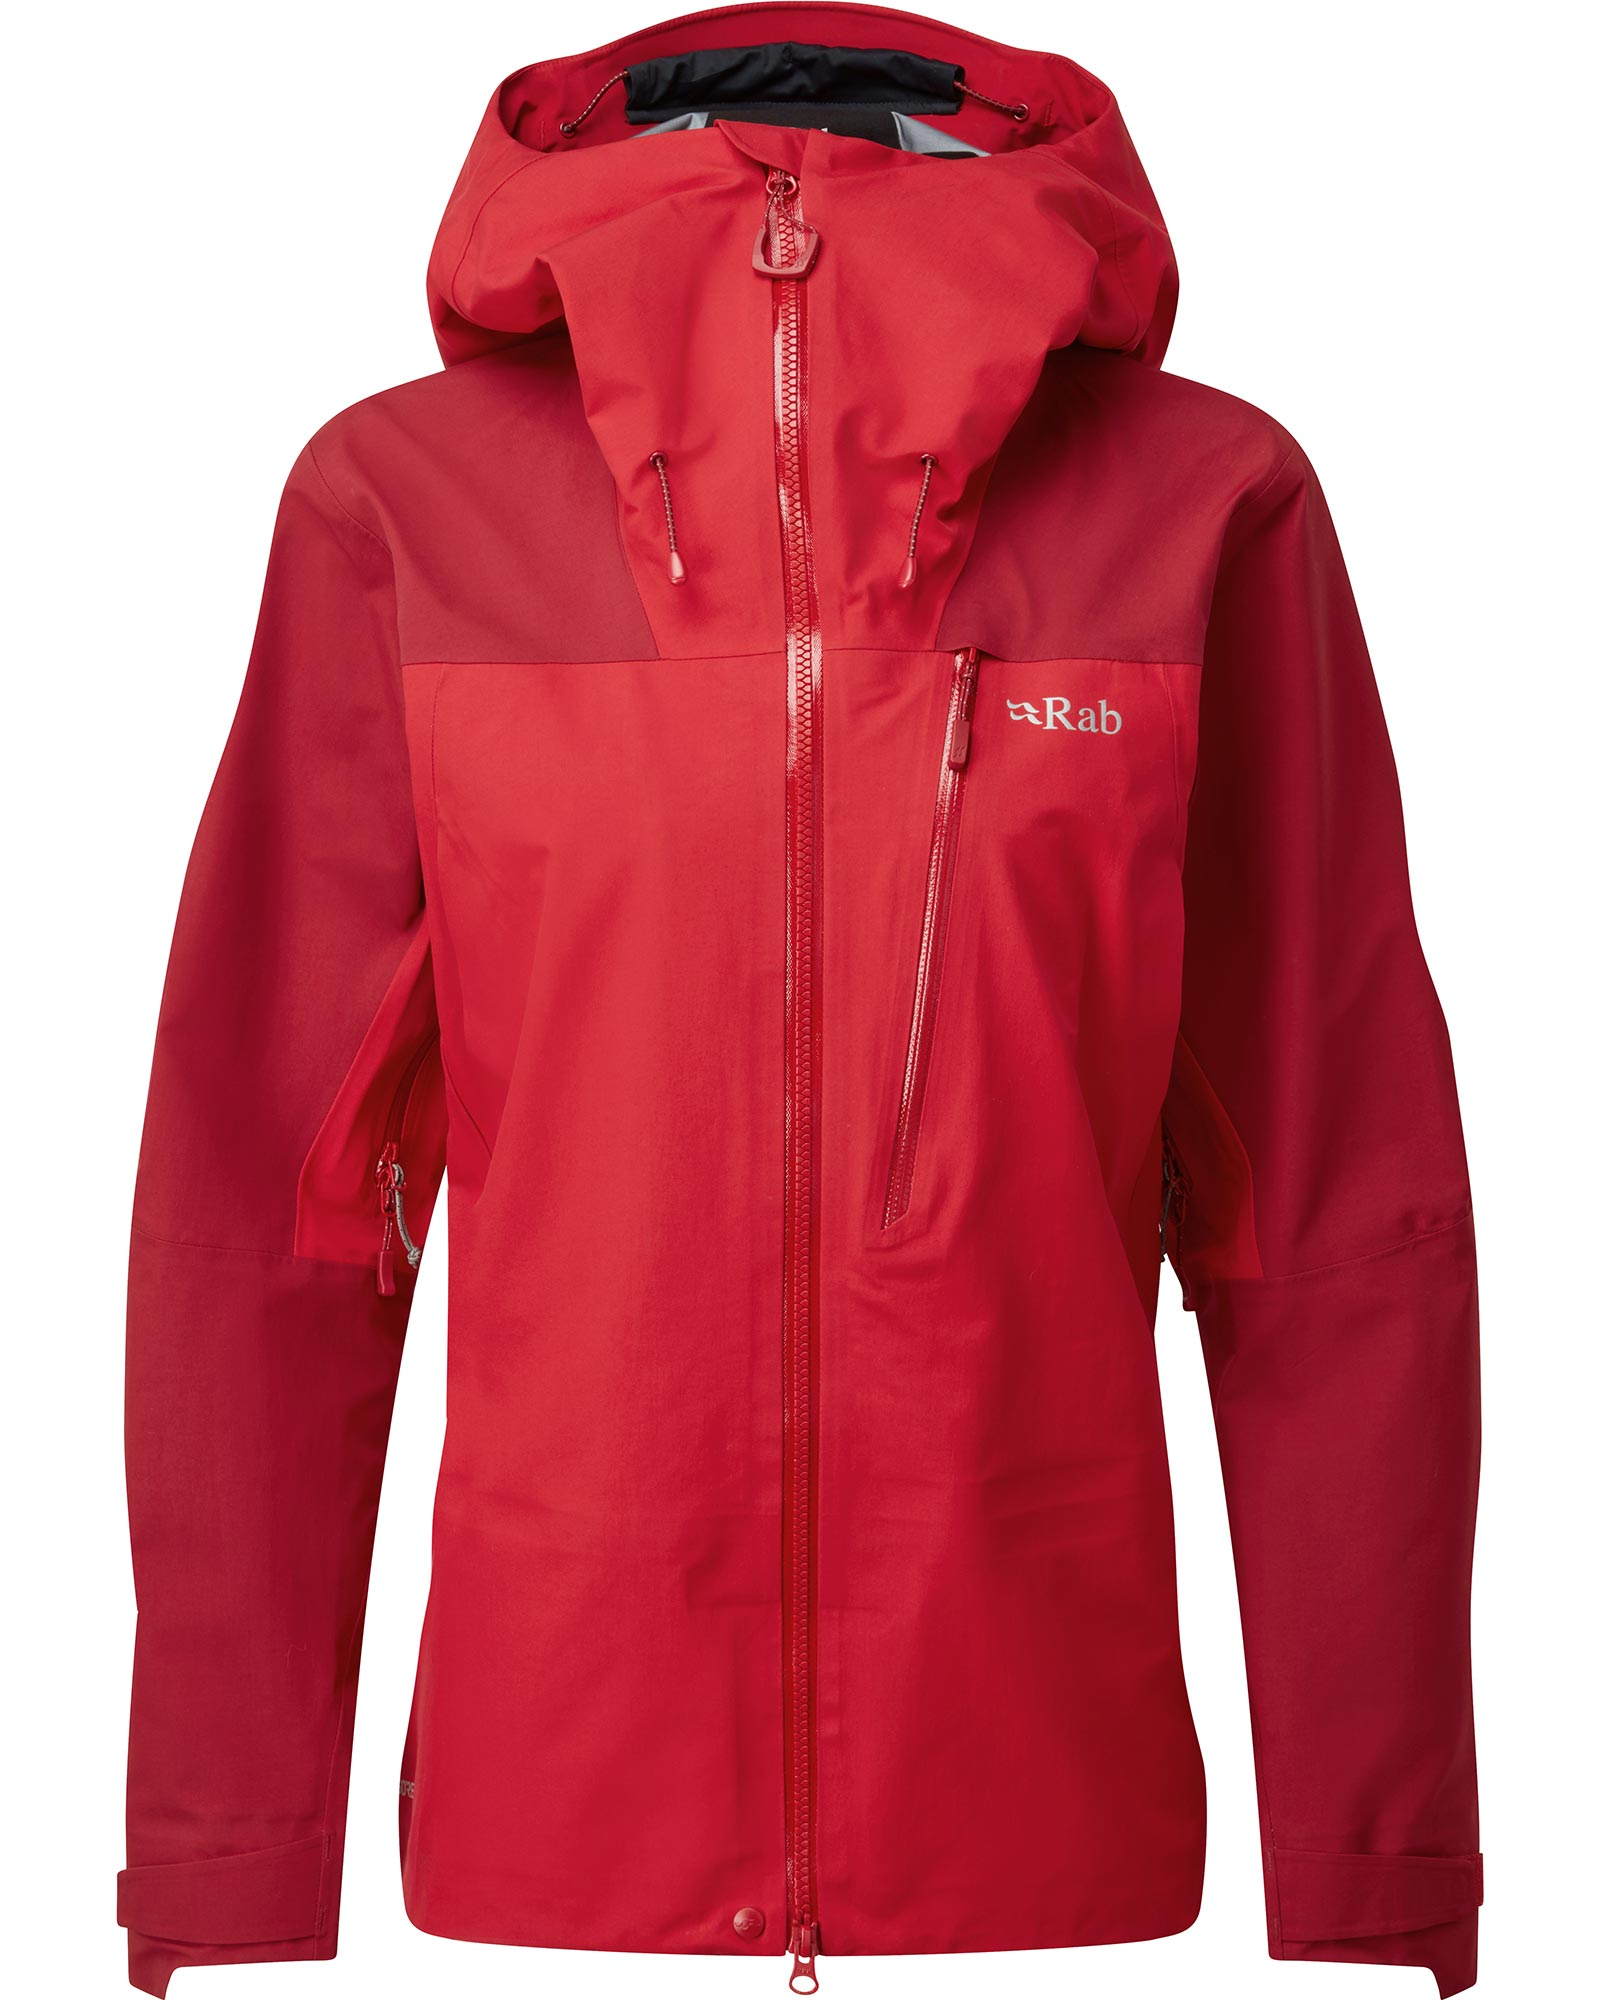 Rab Women's Ladakh GORE-TEX Jacket 0